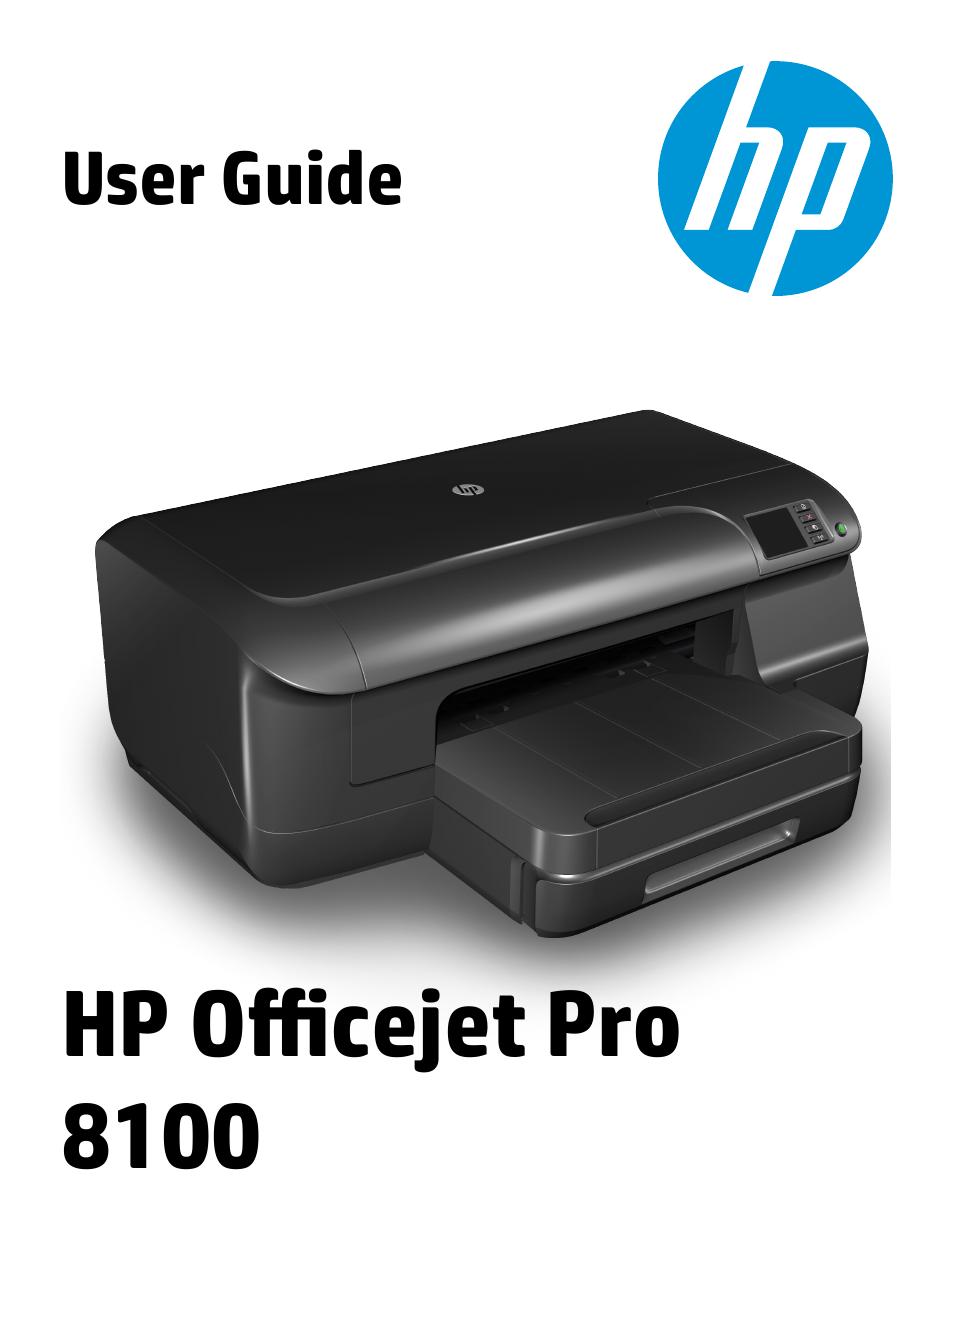 hp officejet pro 8100 eprinter n811a n811d user manual 152 pages rh manualsdir com hp officejet pro 8100 manual pdf hp officejet pro 8100 service manual